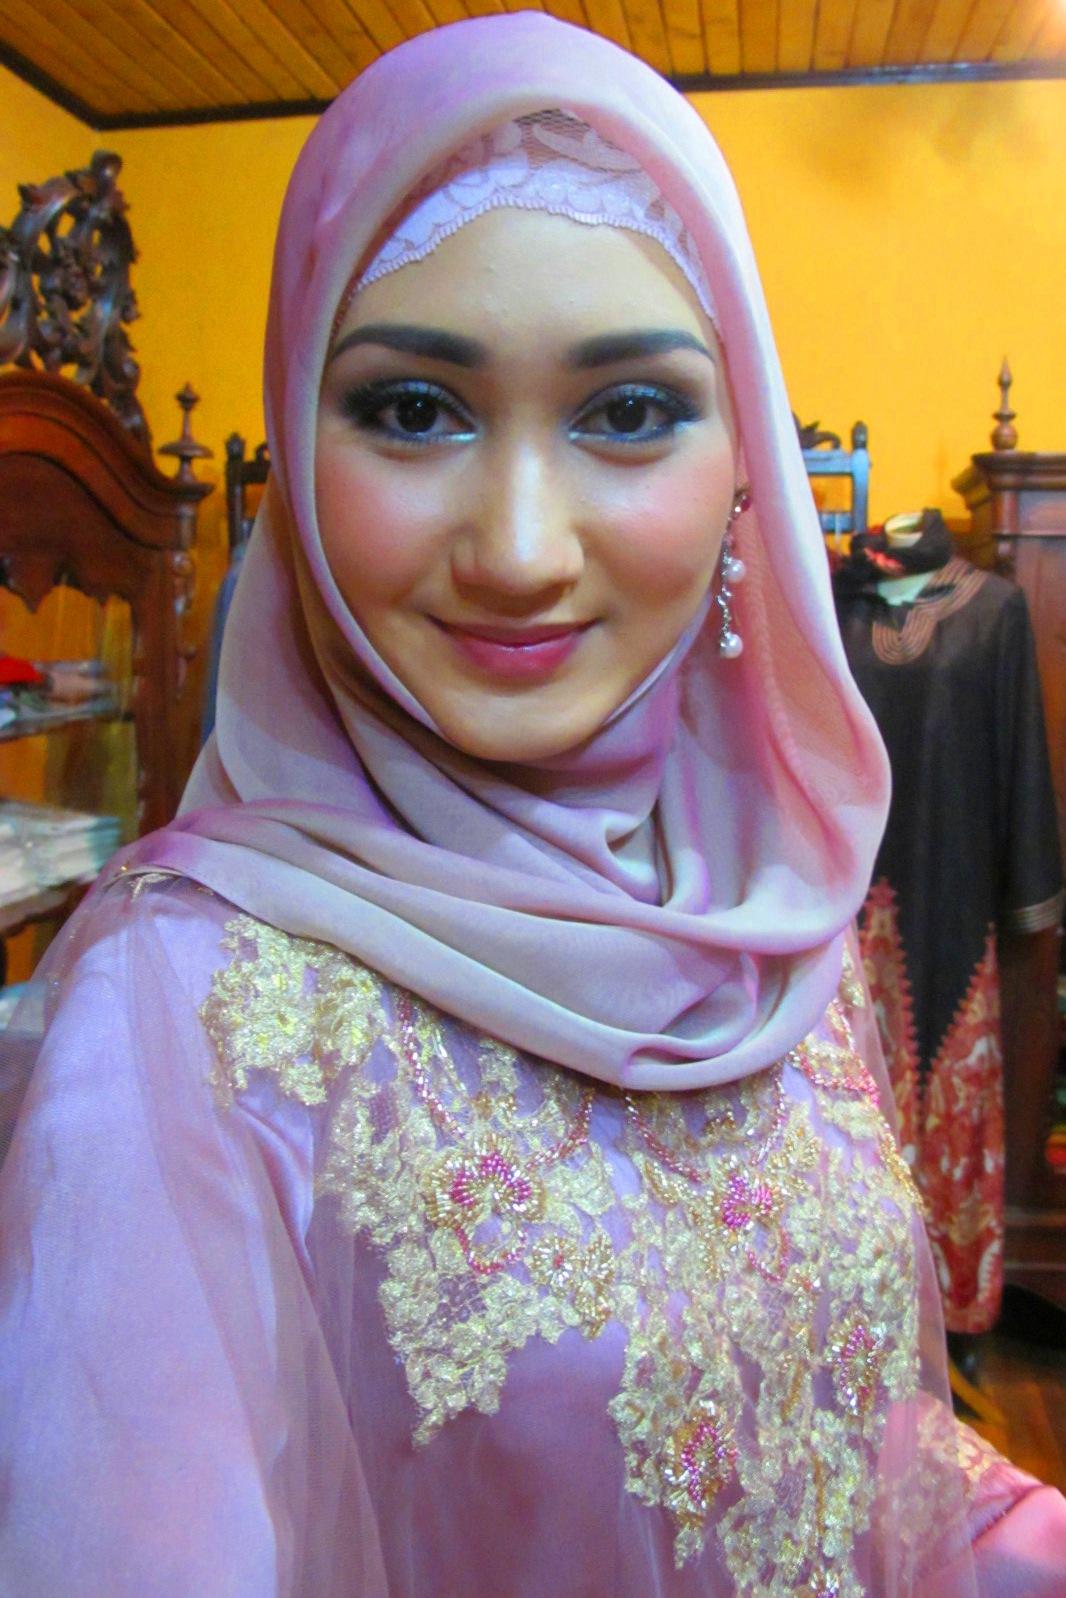 Cara Memakai Jilbab Kerudung Paris Ala Dian Pelangi Quaneshacom